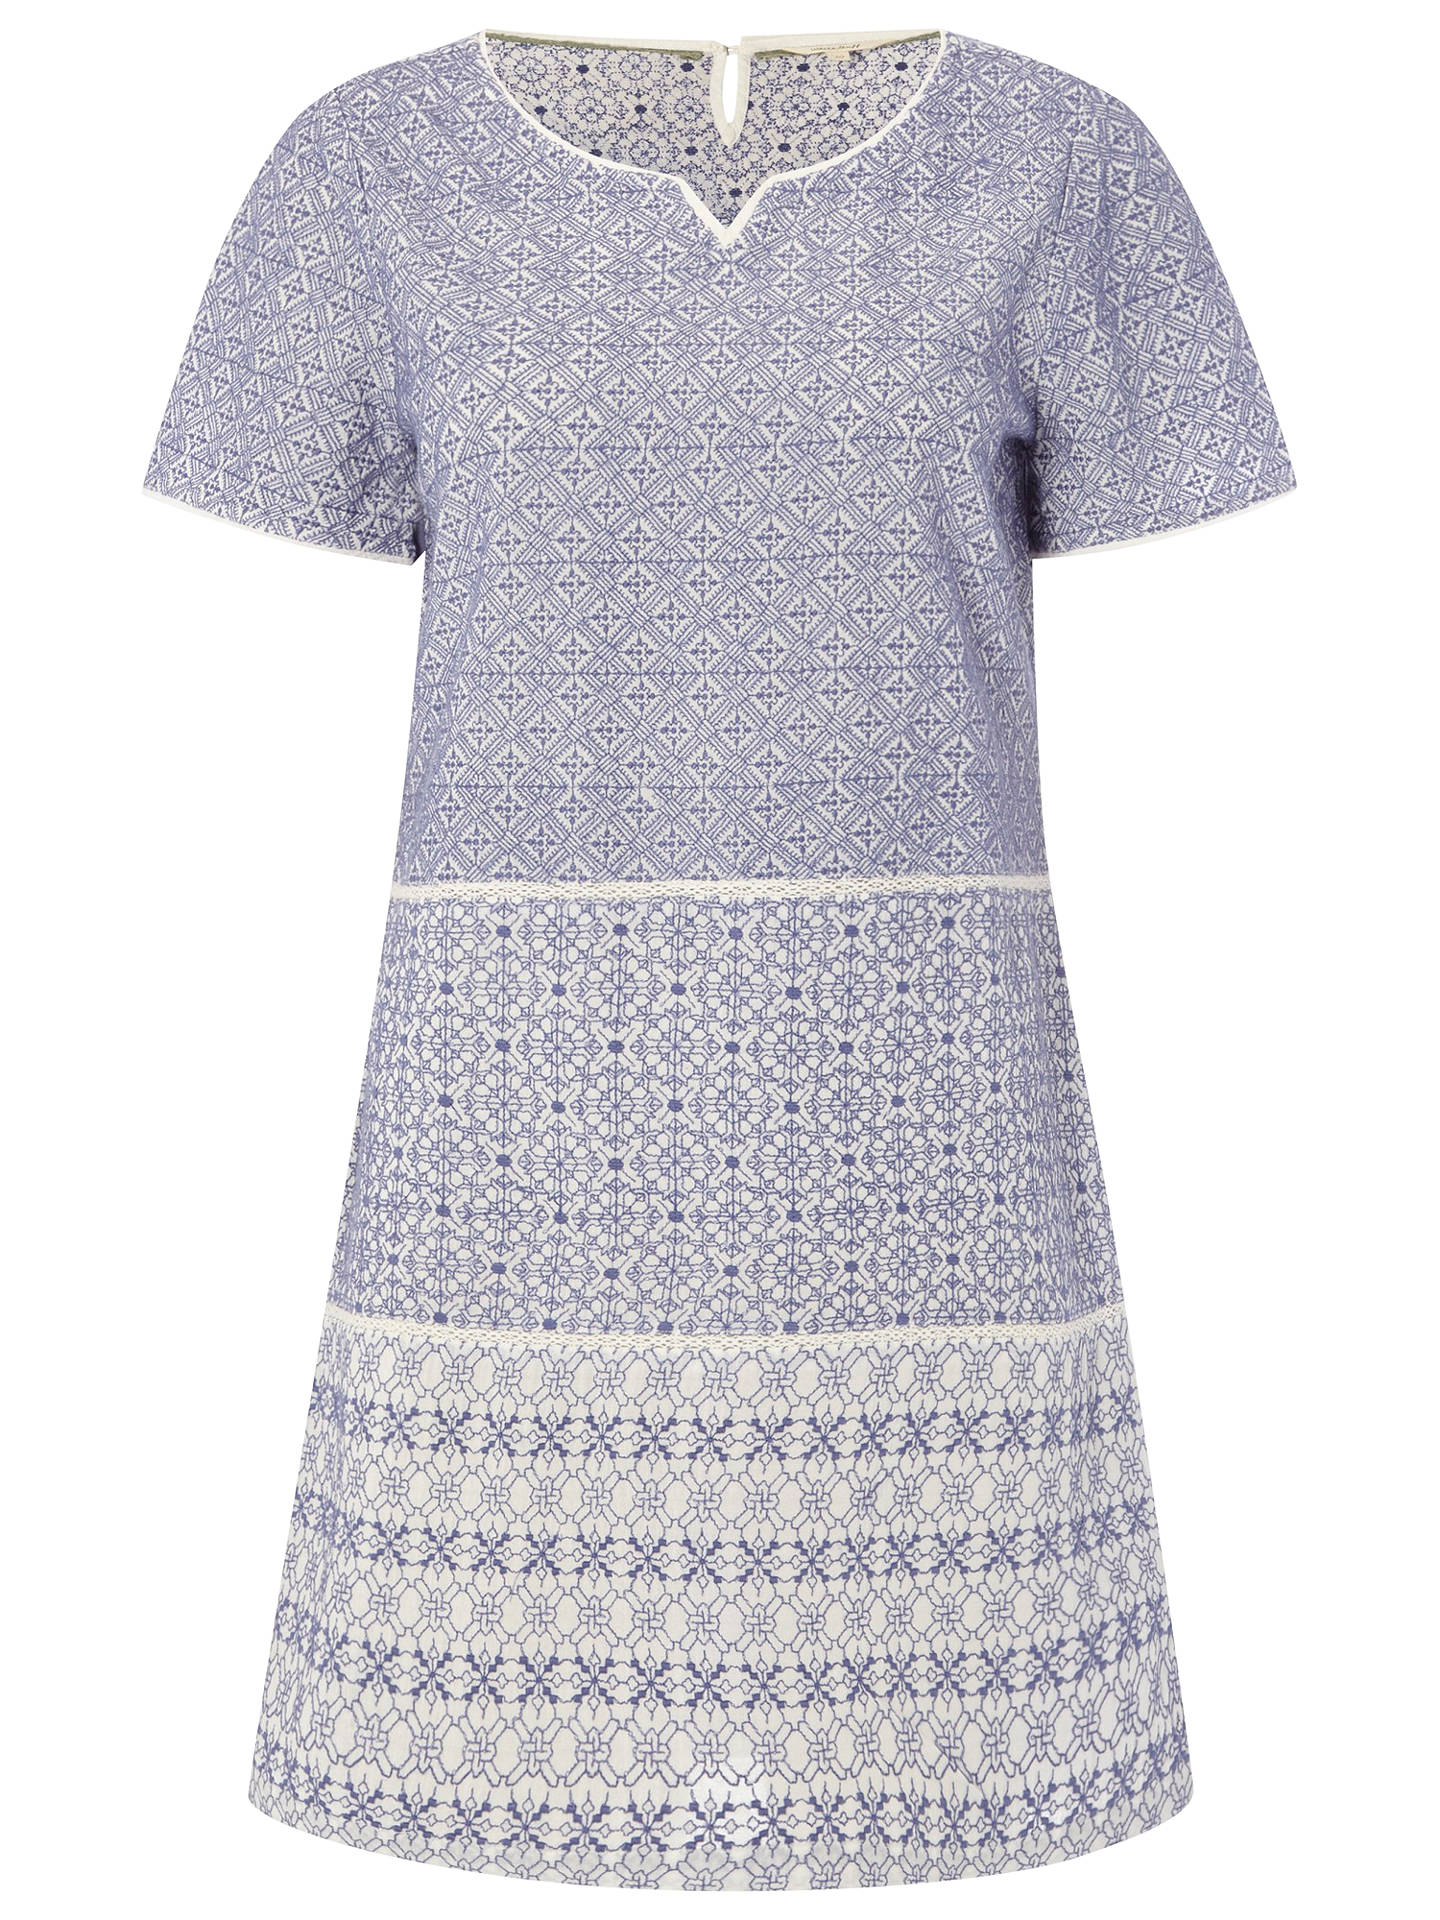 25e8ad9cc2ab BuyWhite Stuff Embroidered Tunic Dress